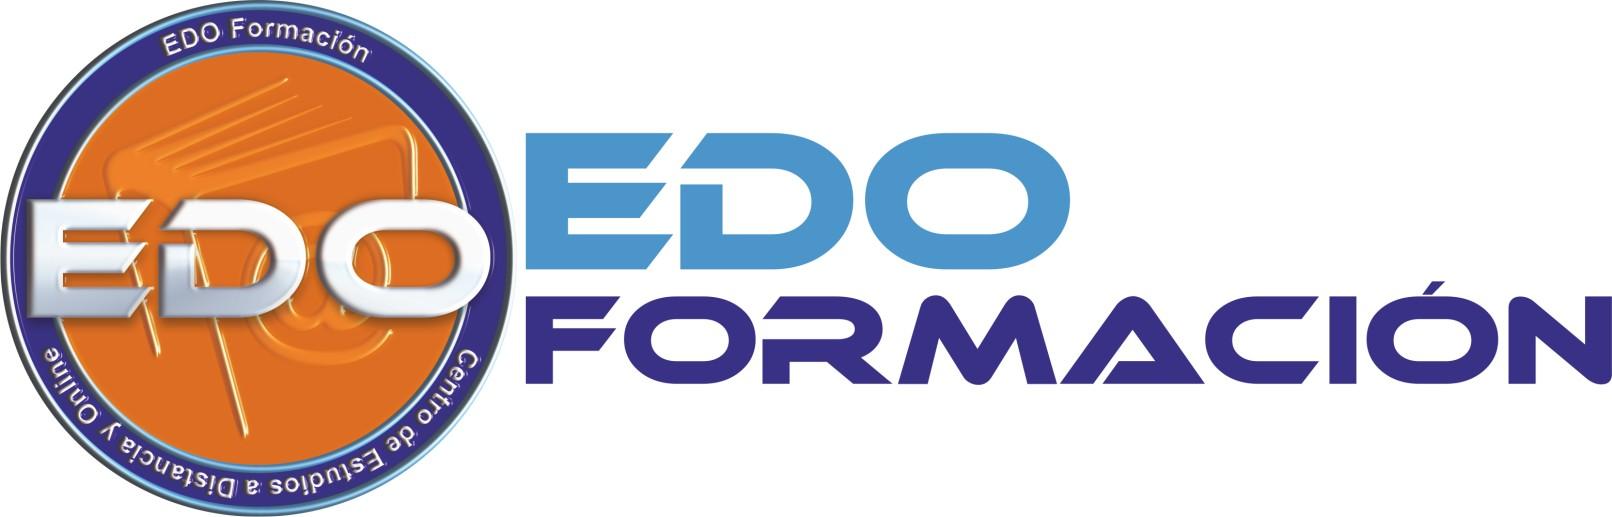 Edo Formacion